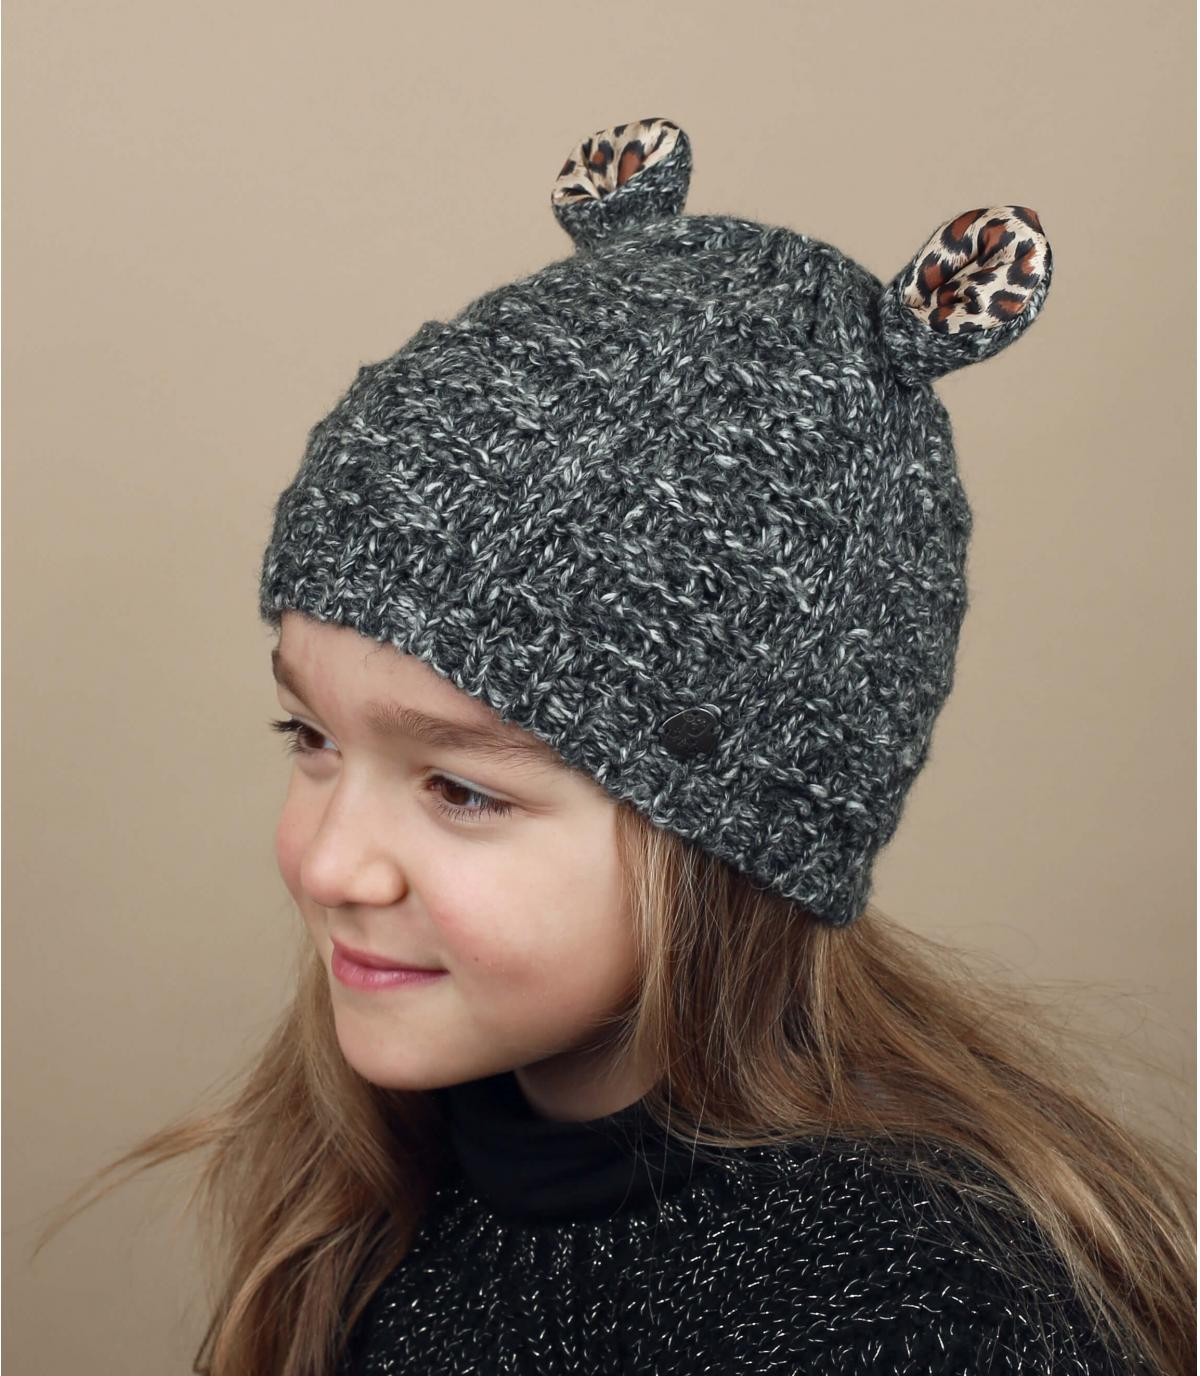 Graue Kinder Mütze